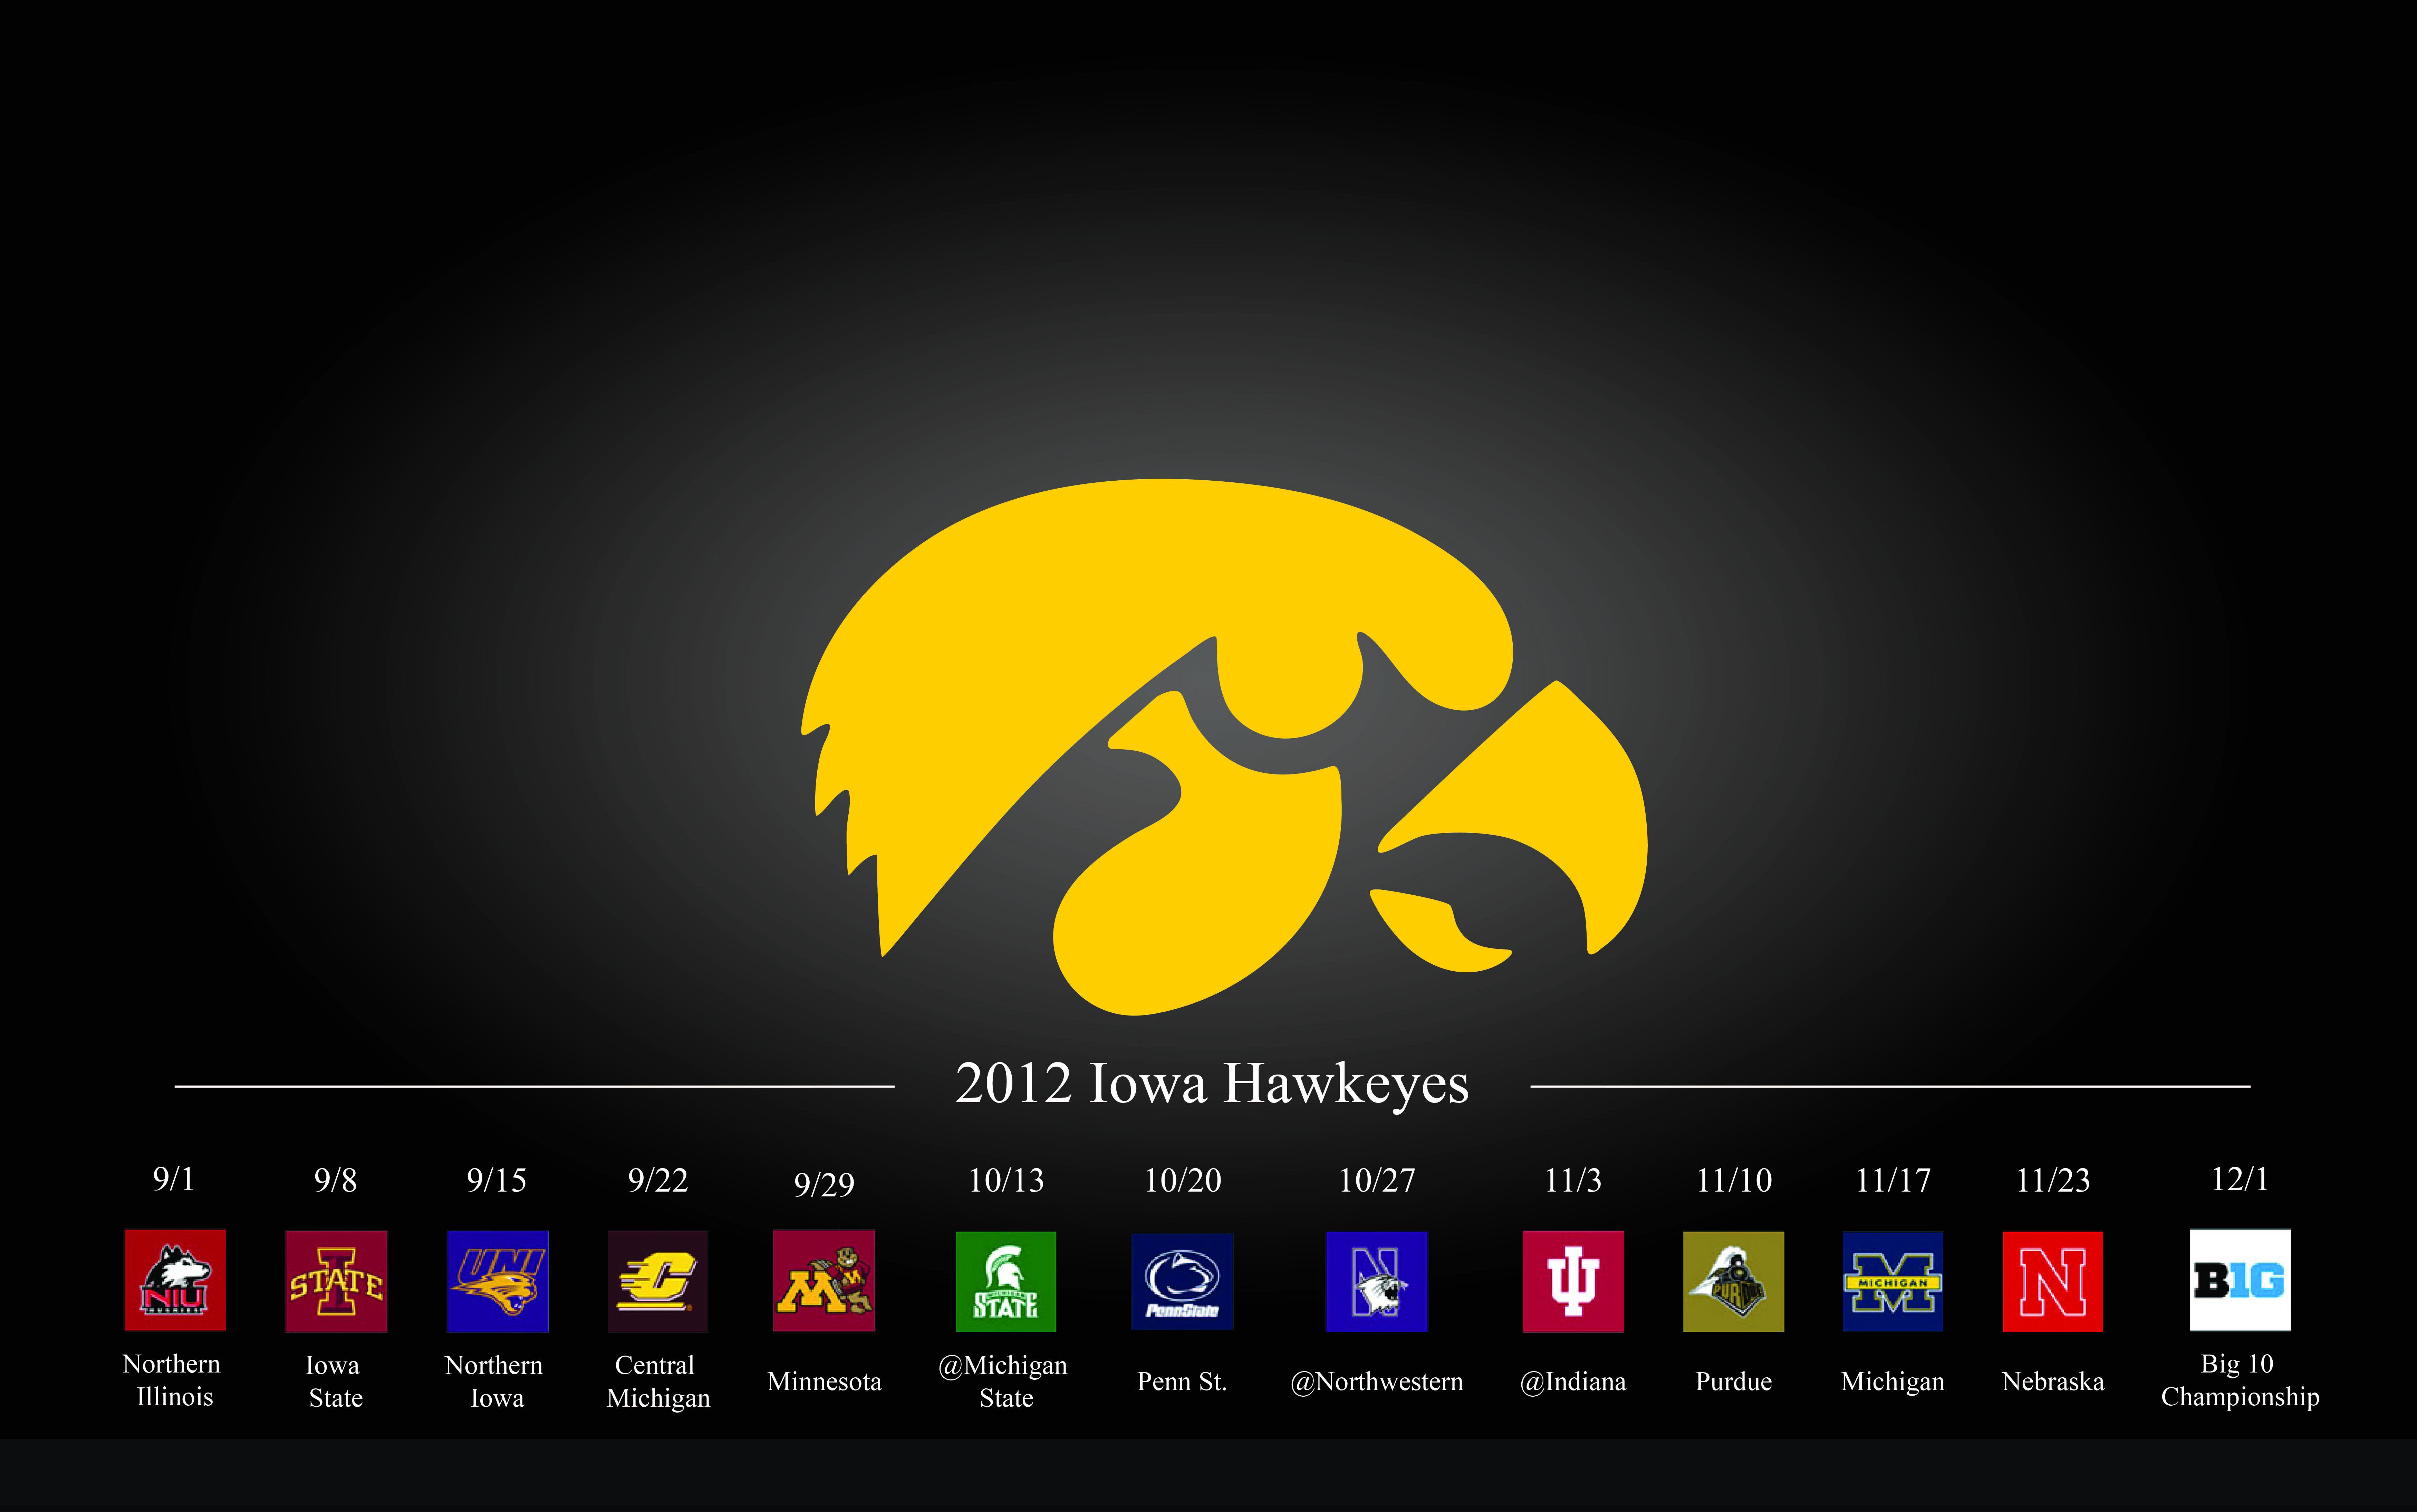 50+] Iowa Hawkeyes iPhone Wallpaper on